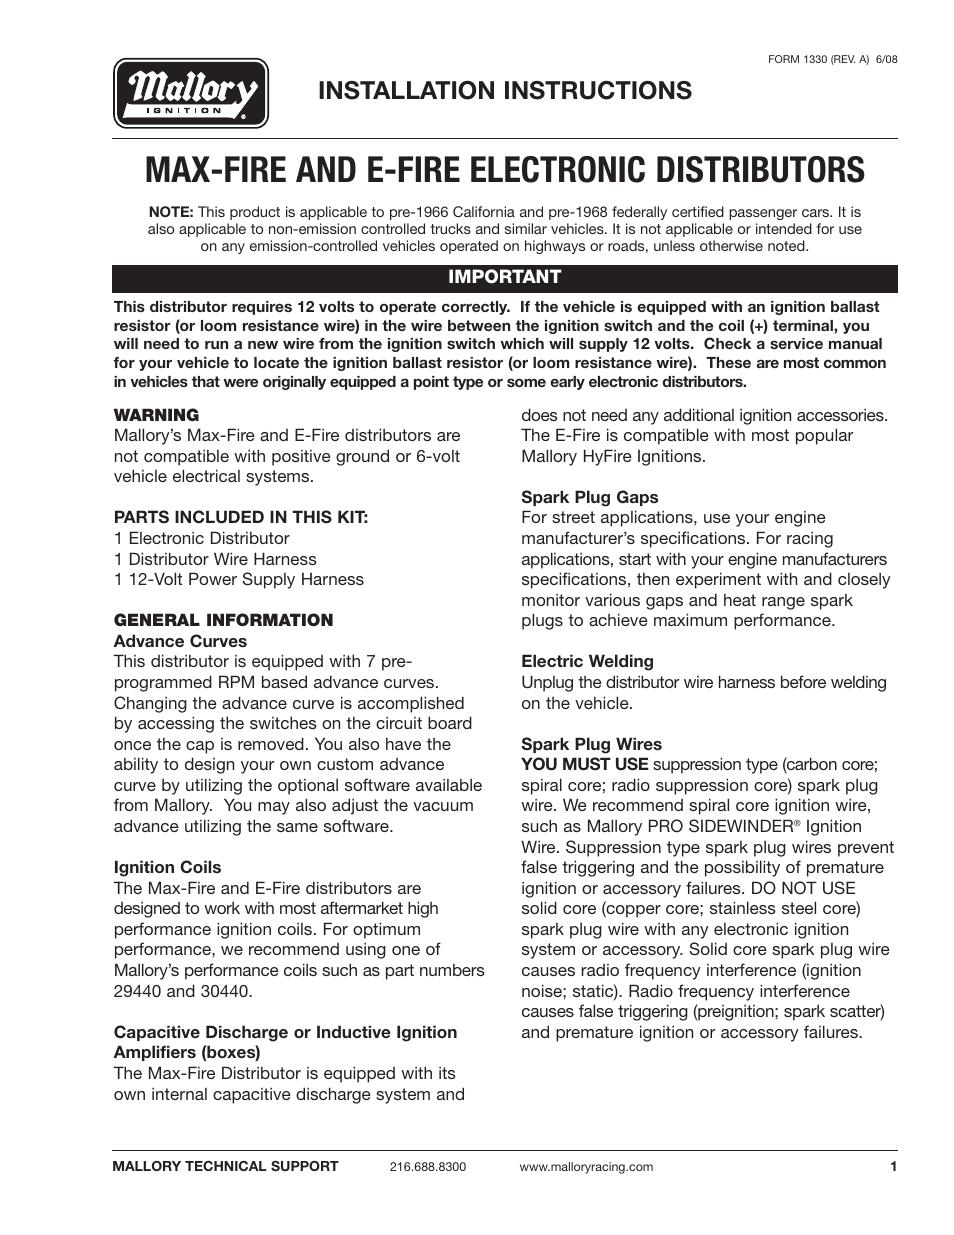 Modern Mallory Electronic Distributor Wiring Diagram Pattern ...